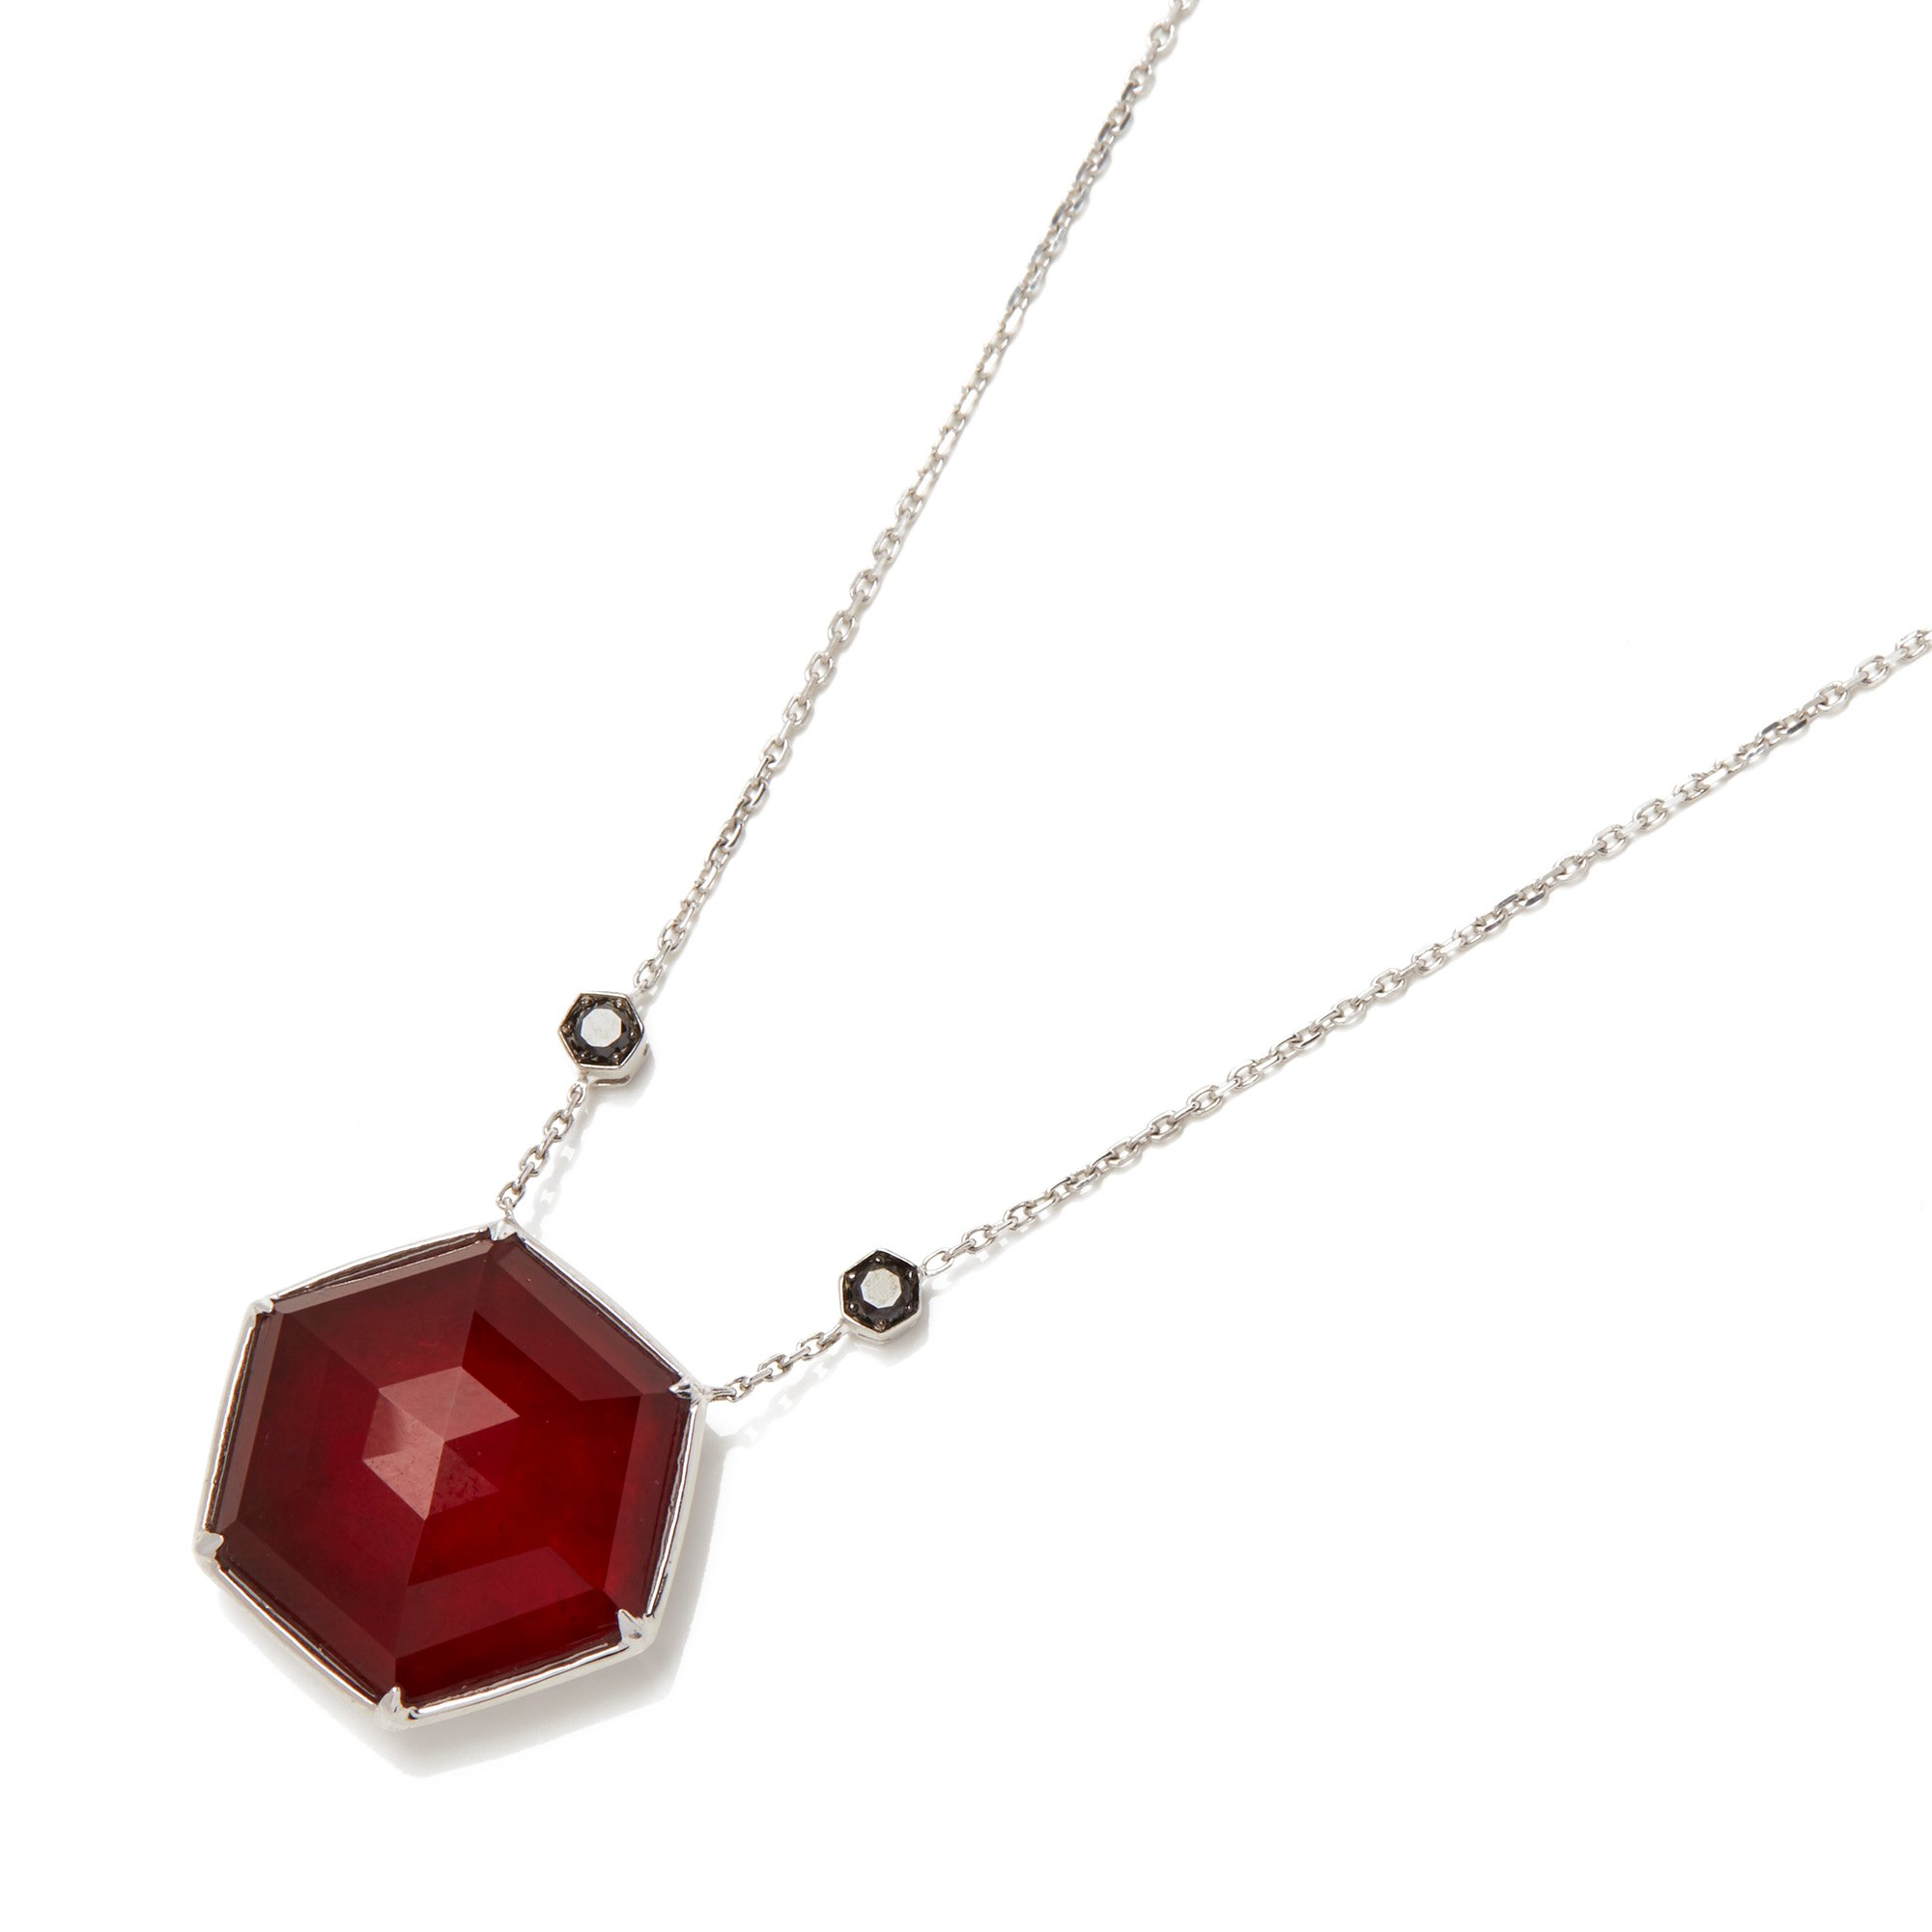 Stephen Webster Deco Haze 18ct Gold Black Diamond and Ruby Quartz Crystal Haze Necklace